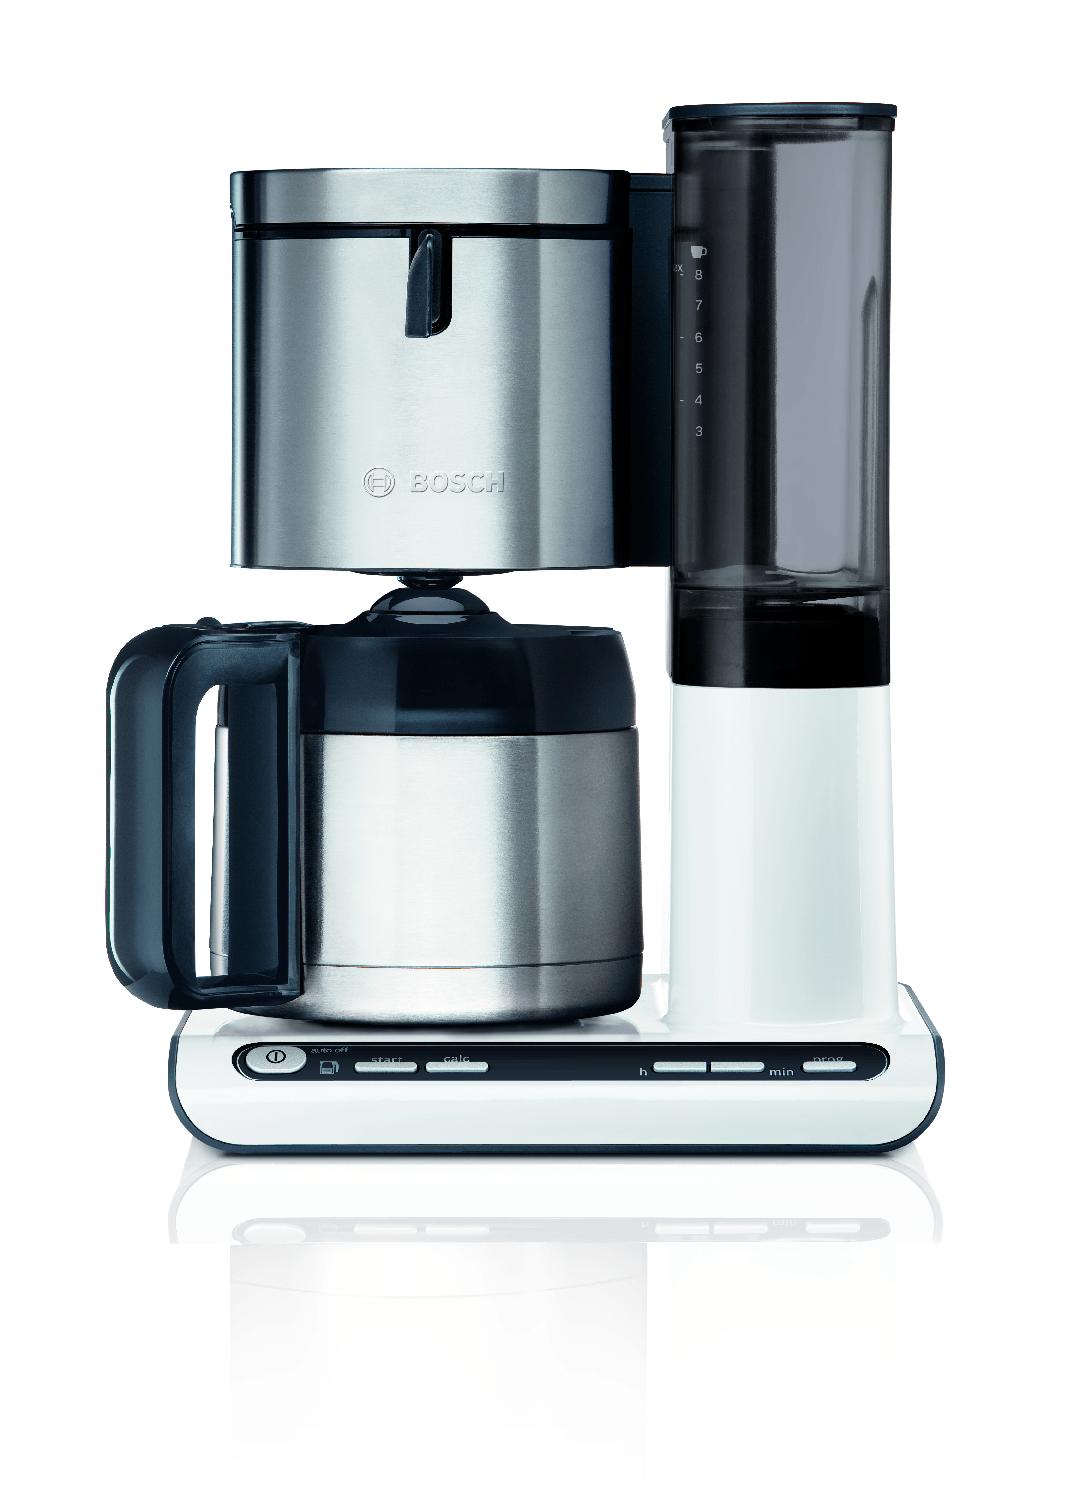 Bosch TKA8651 Styline Koffiezetapparaat, 1L Wit&Antraciet